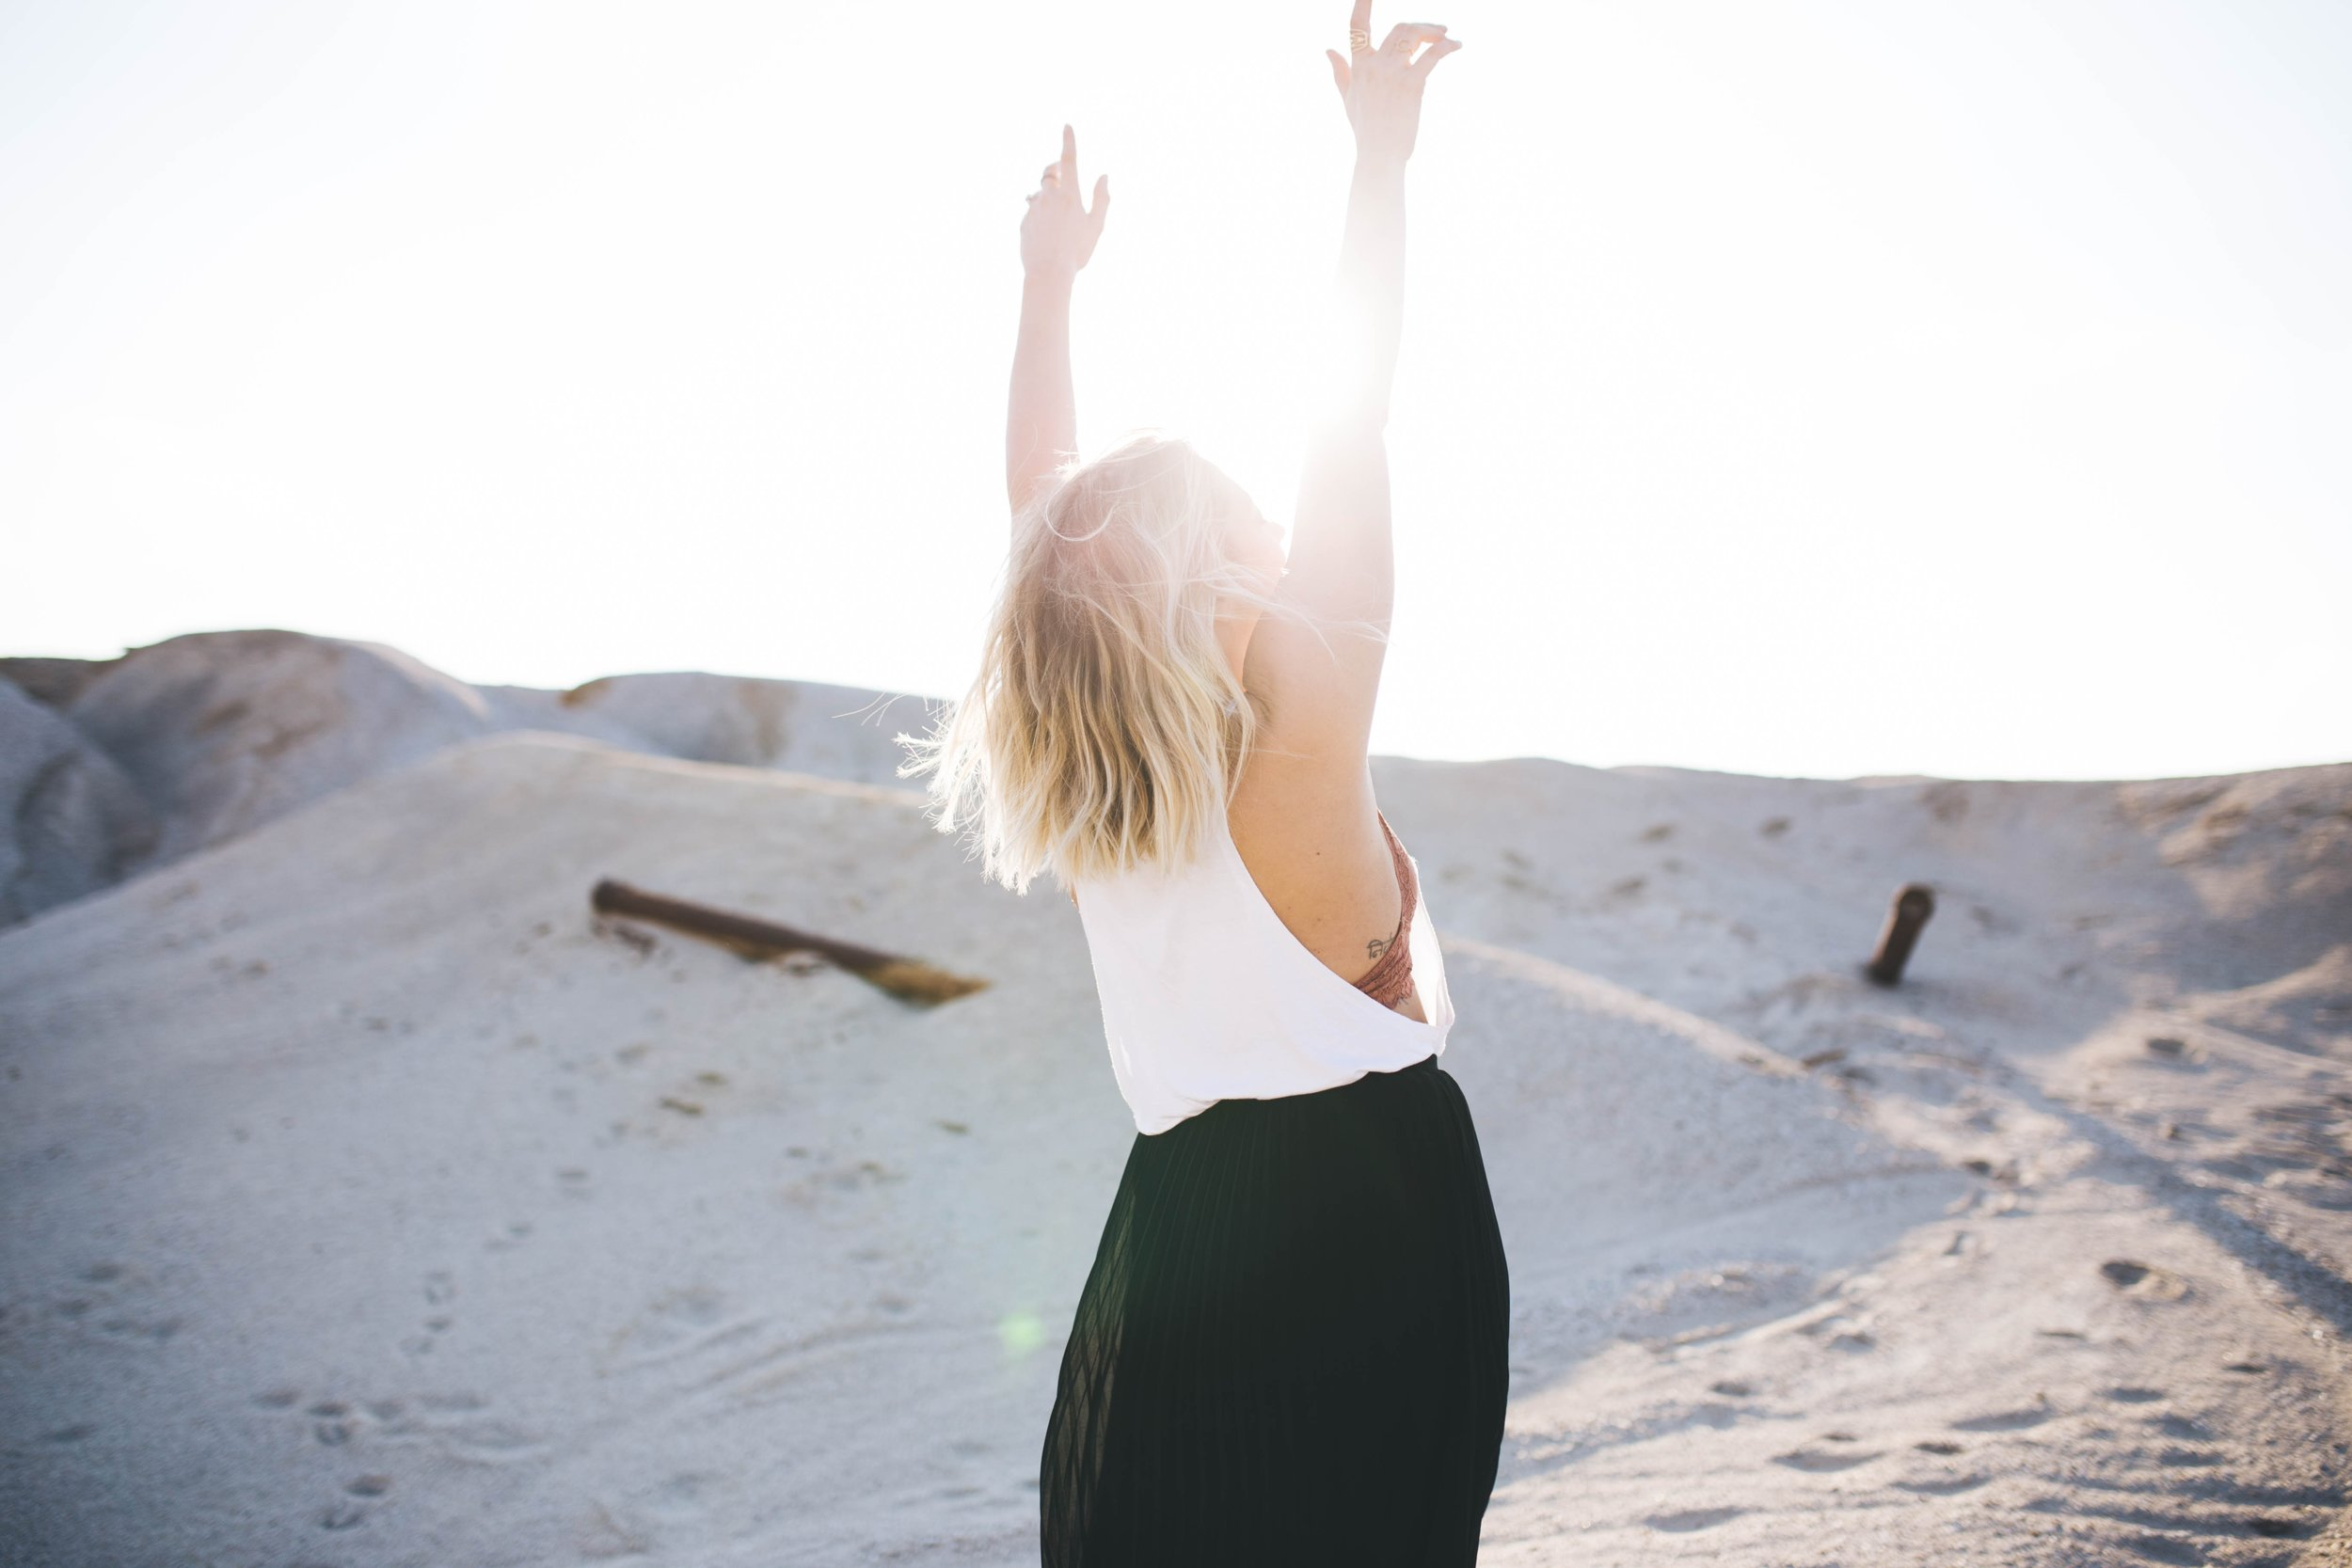 SIBO Treatment with Xifaxan and Neomycin - My Experience | The Gut Healing Ninja